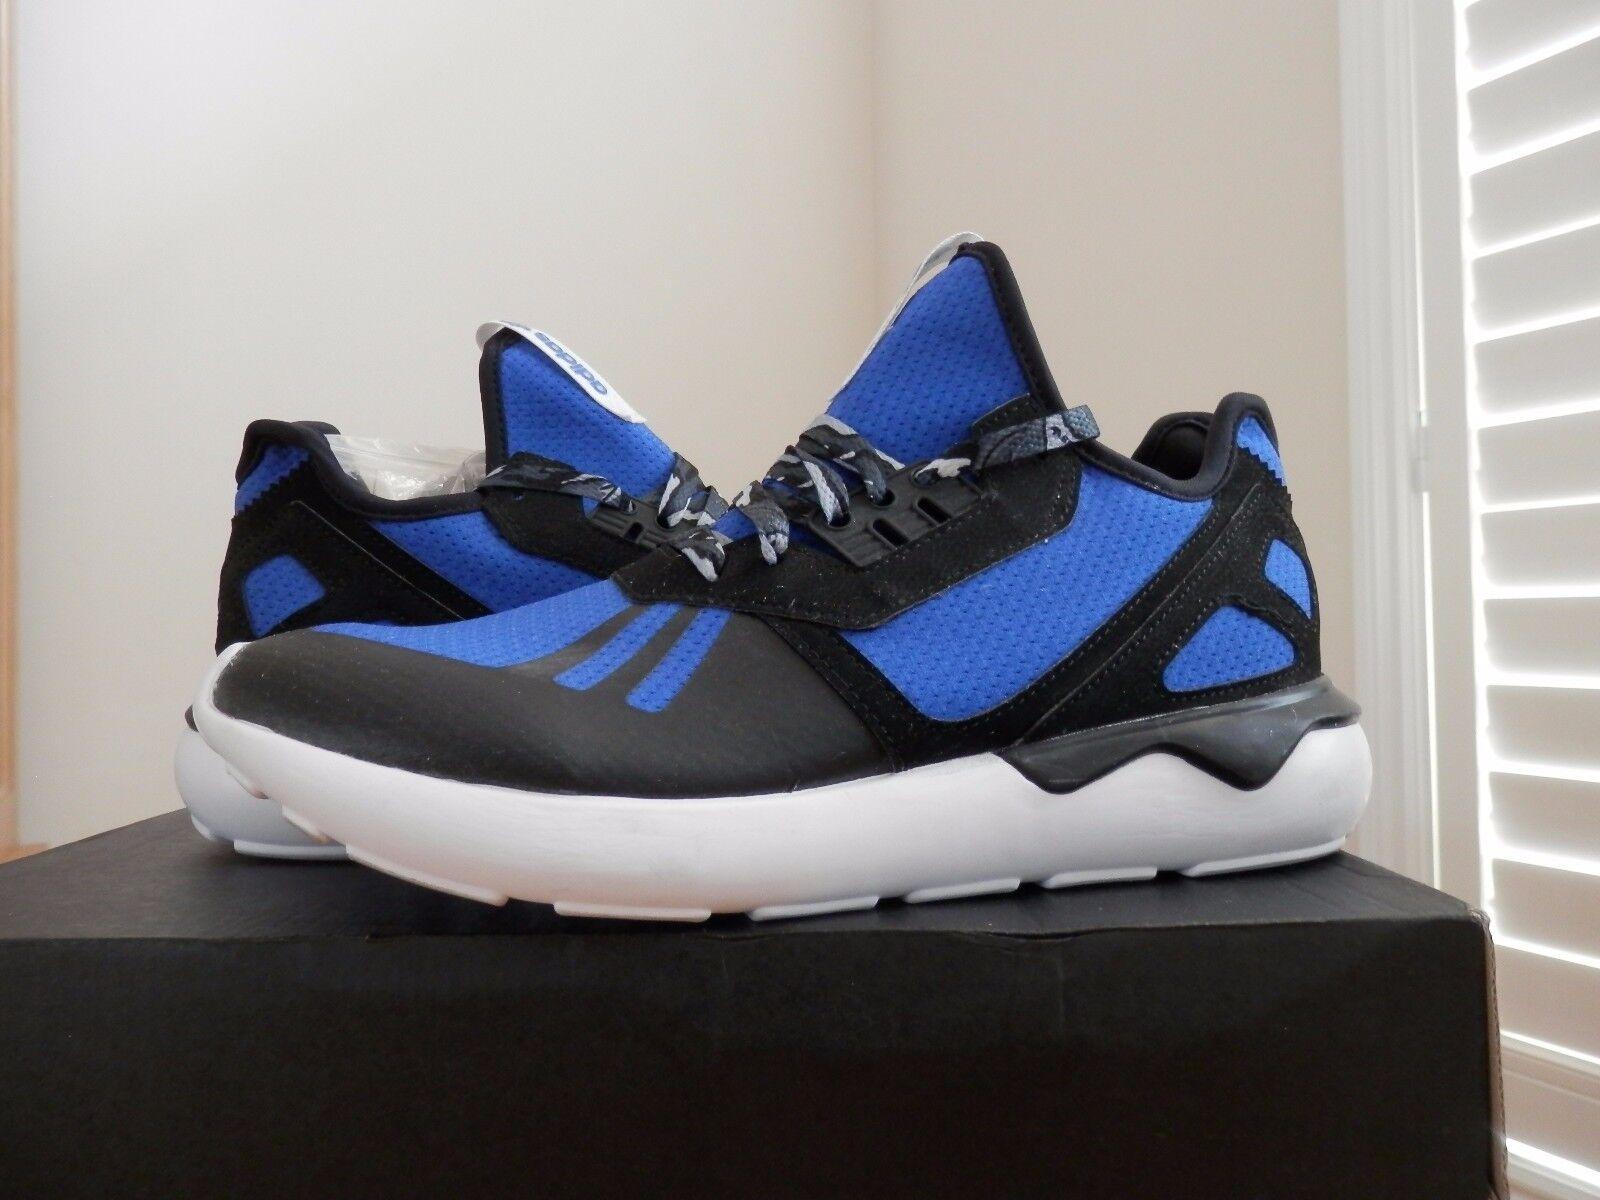 Uomo adidas tubulare scarpe originali runner scarpe tubulare nuove, blu / nero duke b25953 sku eeed6b